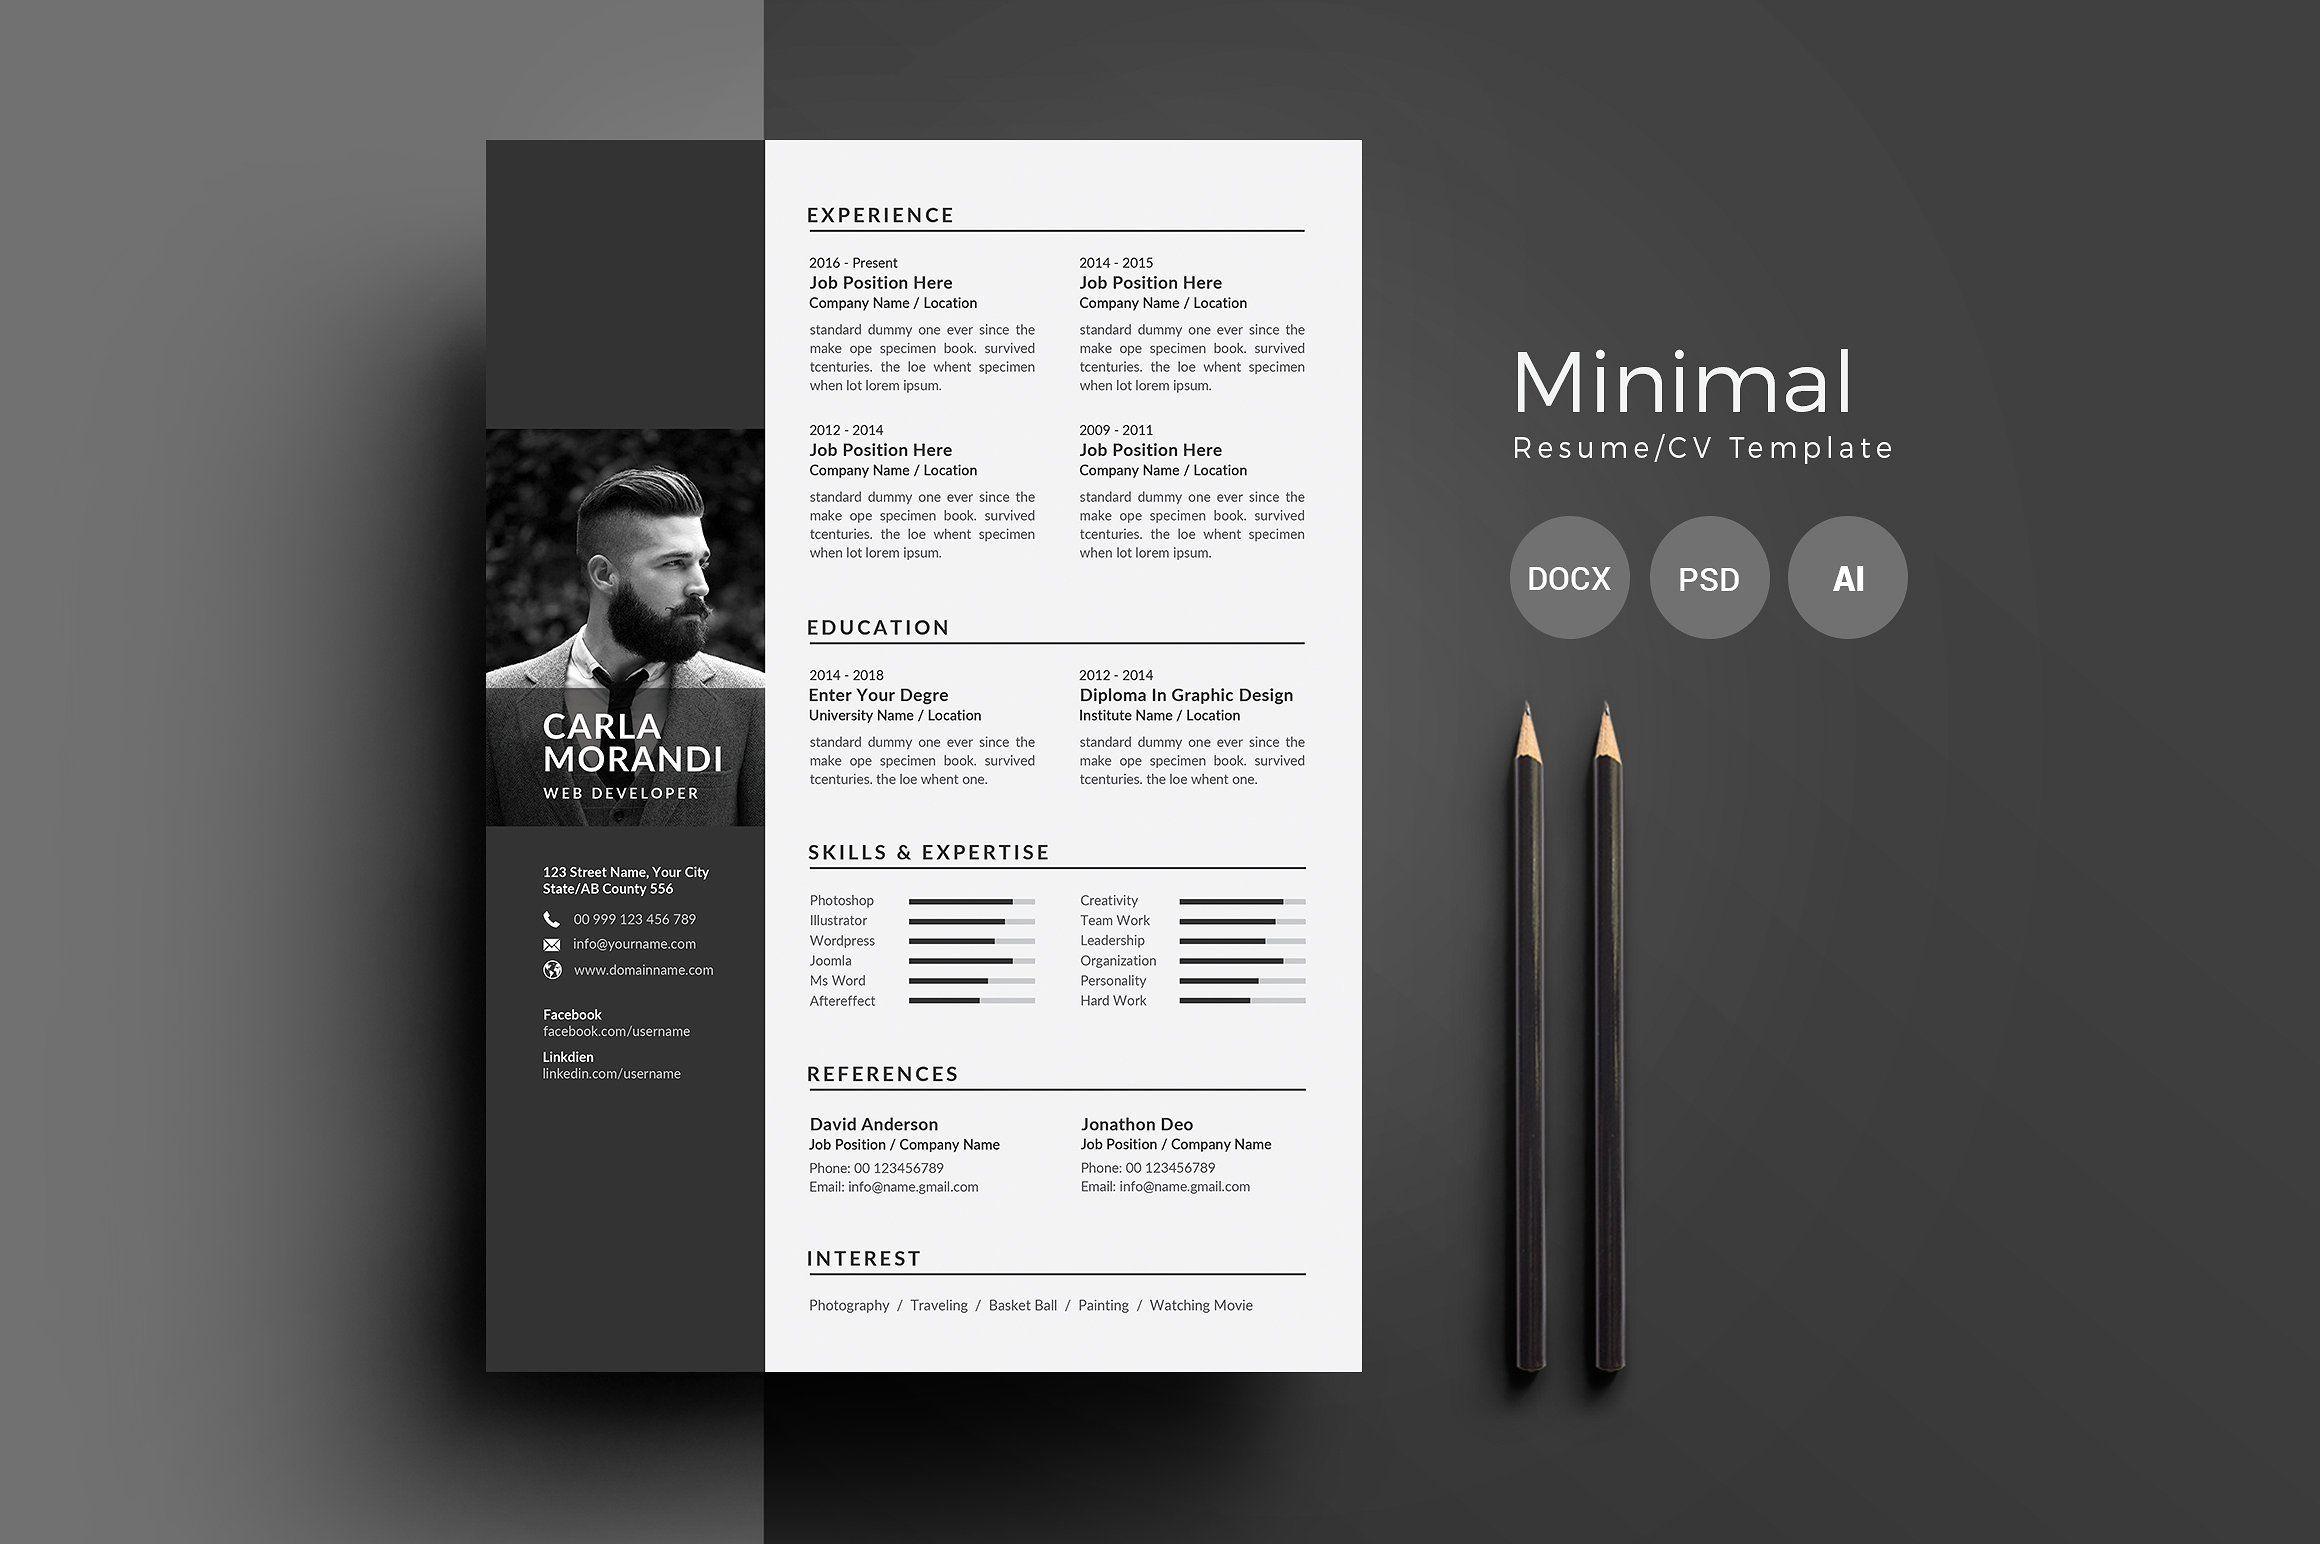 Monogram Resume Template Modern Resume Professional Resume Free Resume Template Resume Icons Resum Resume Design Free Resume Design Resume Design Template